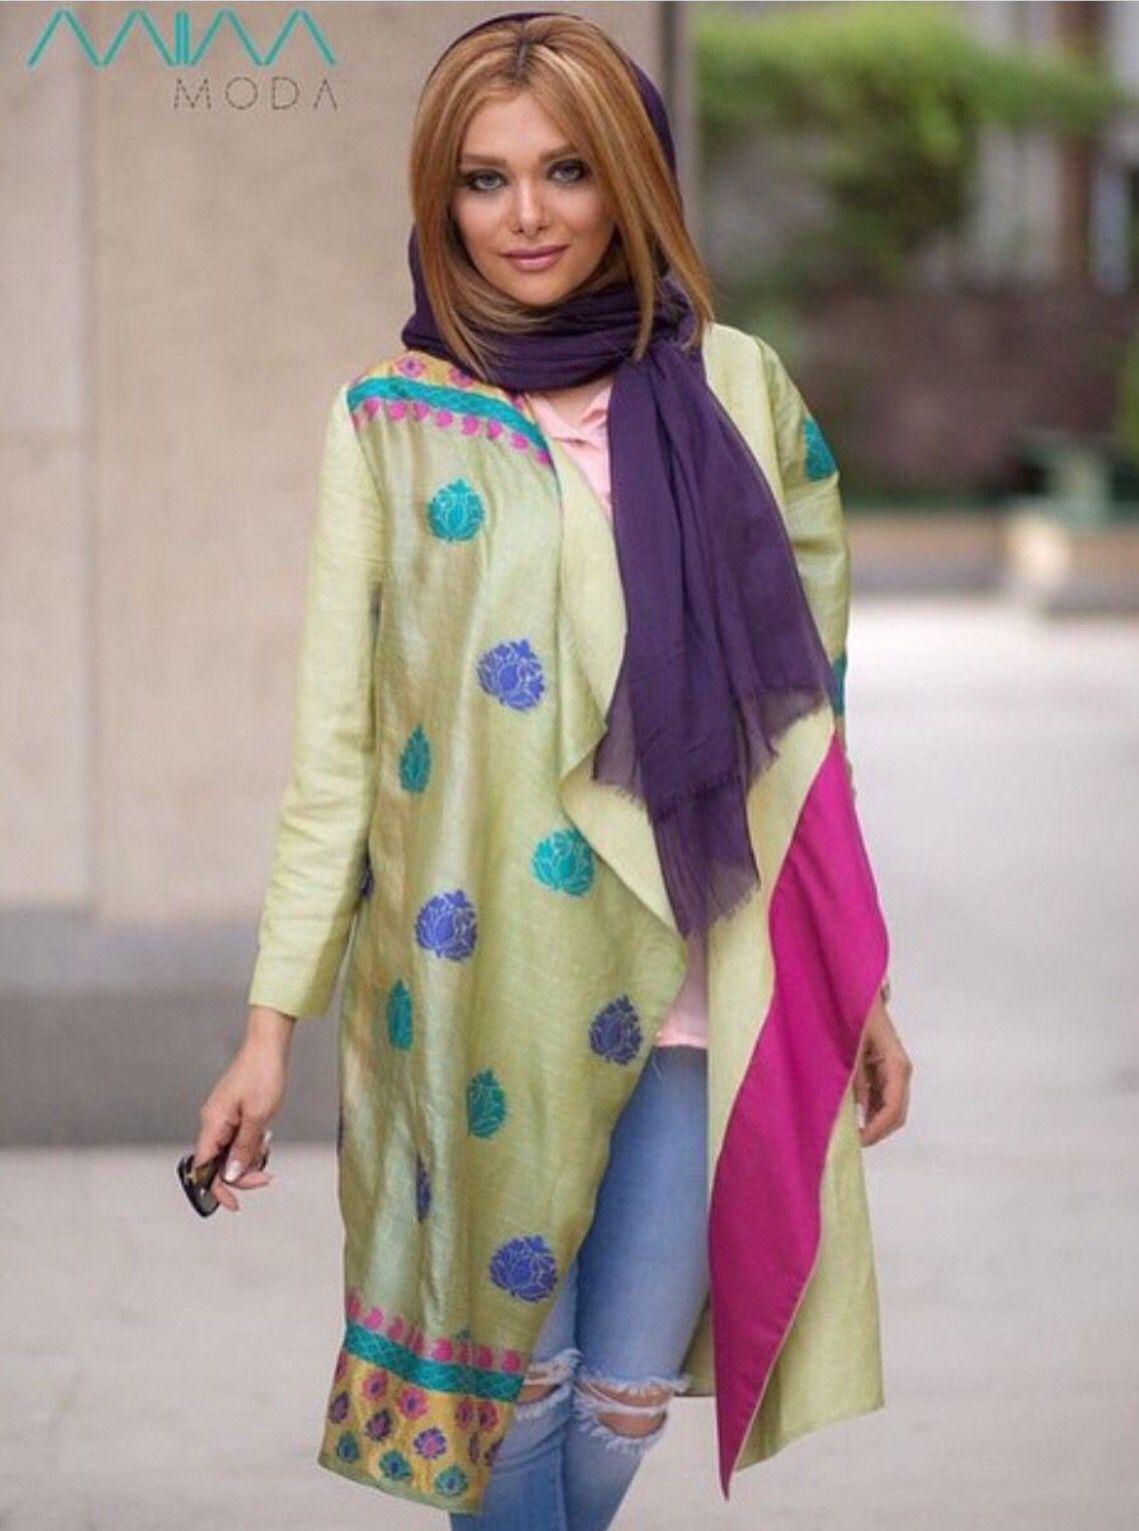 Womens fashion in Iran | Magic Carpet Travel